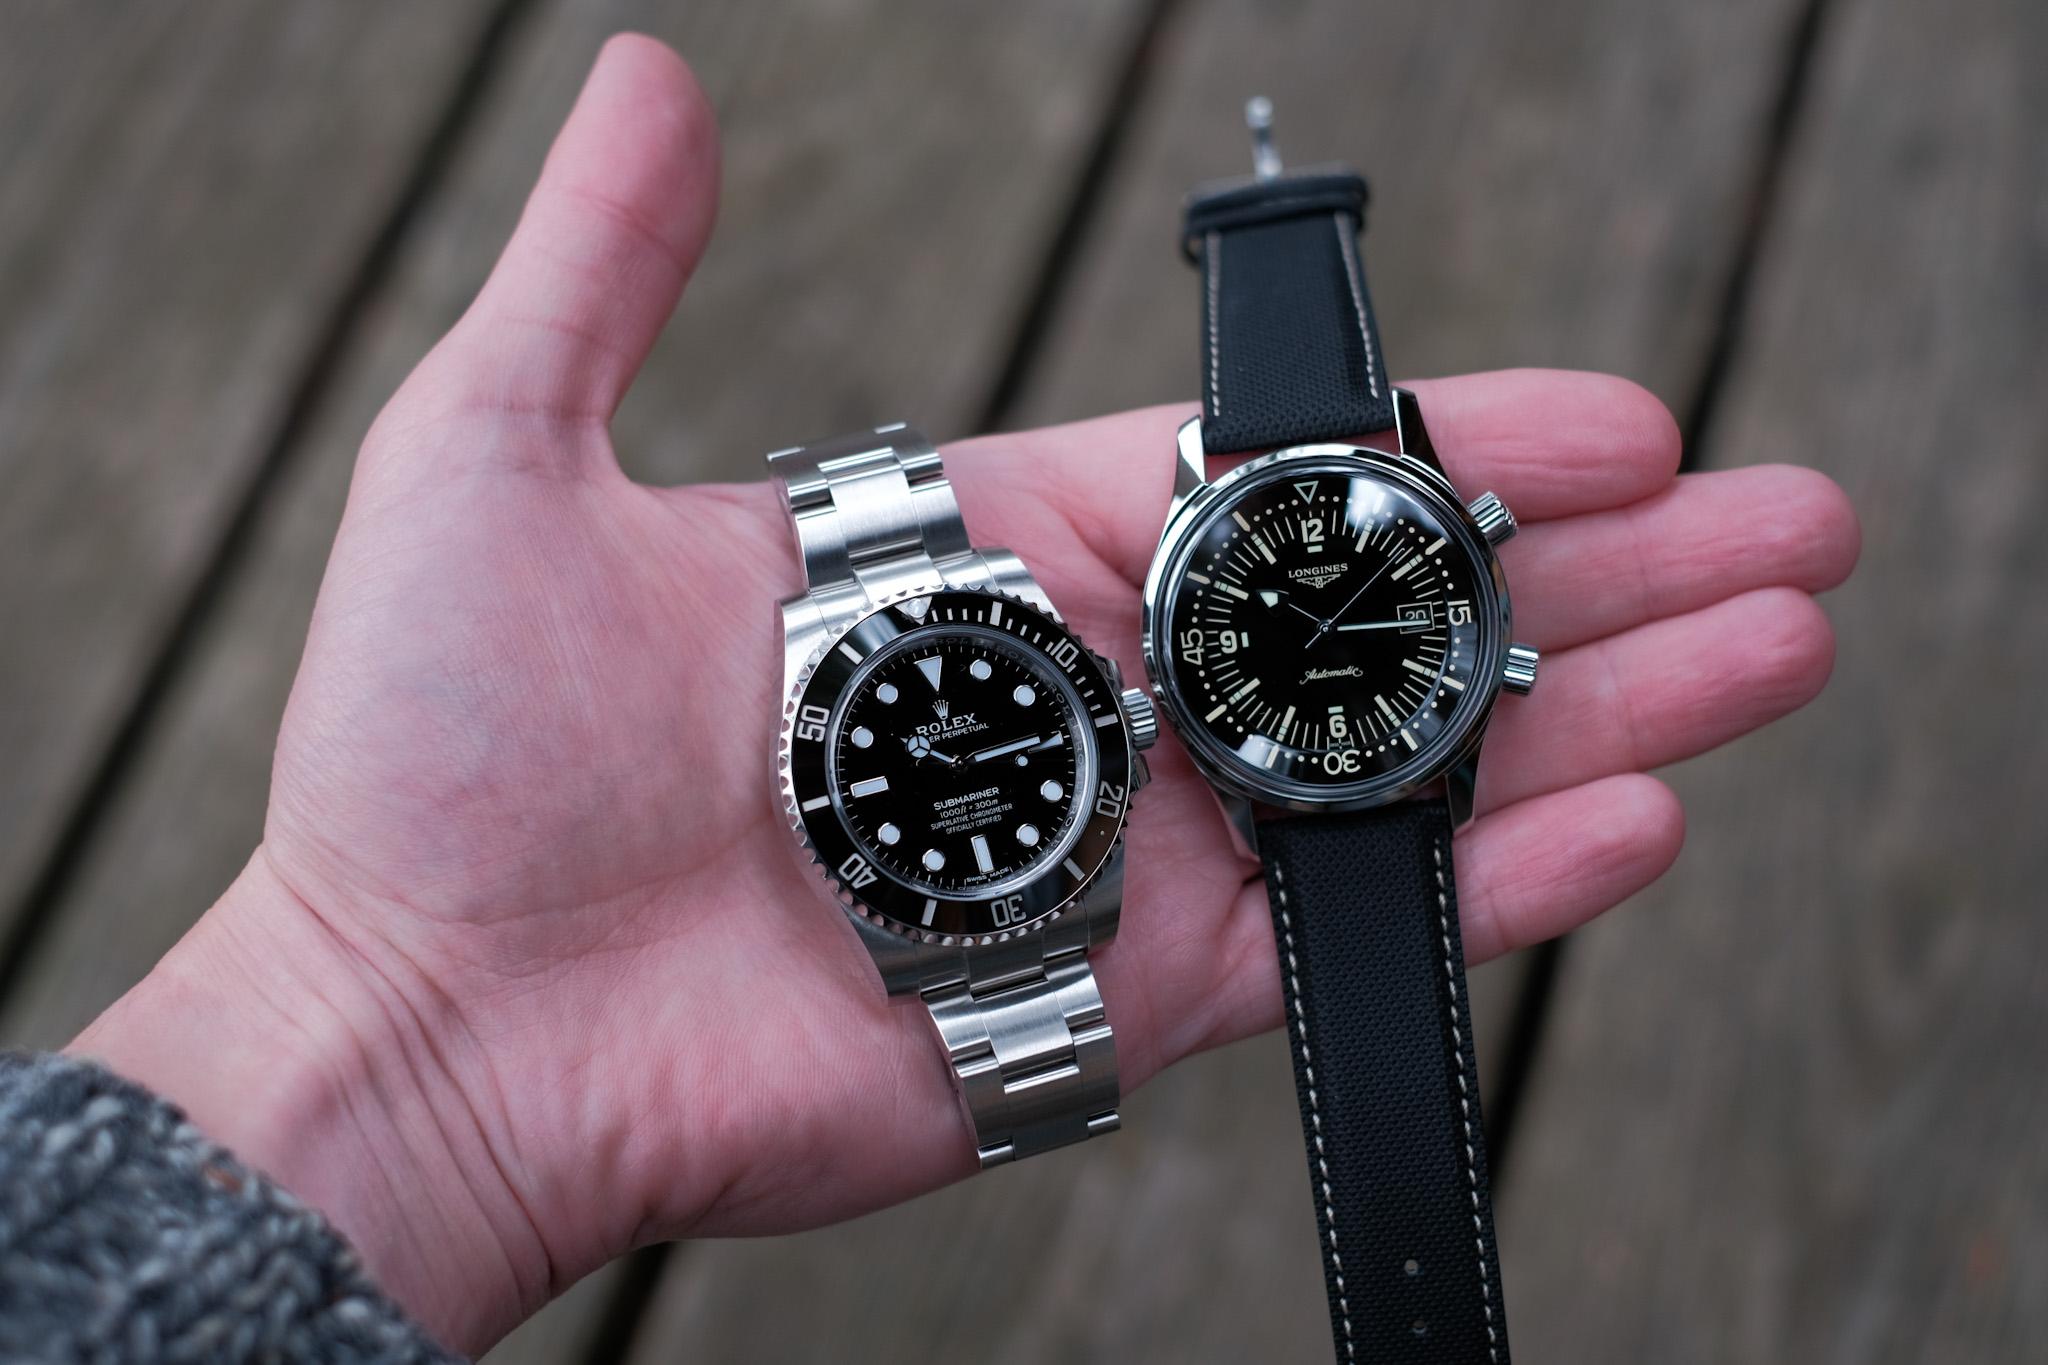 Longines Legend Diver beside the Rolex Submariner